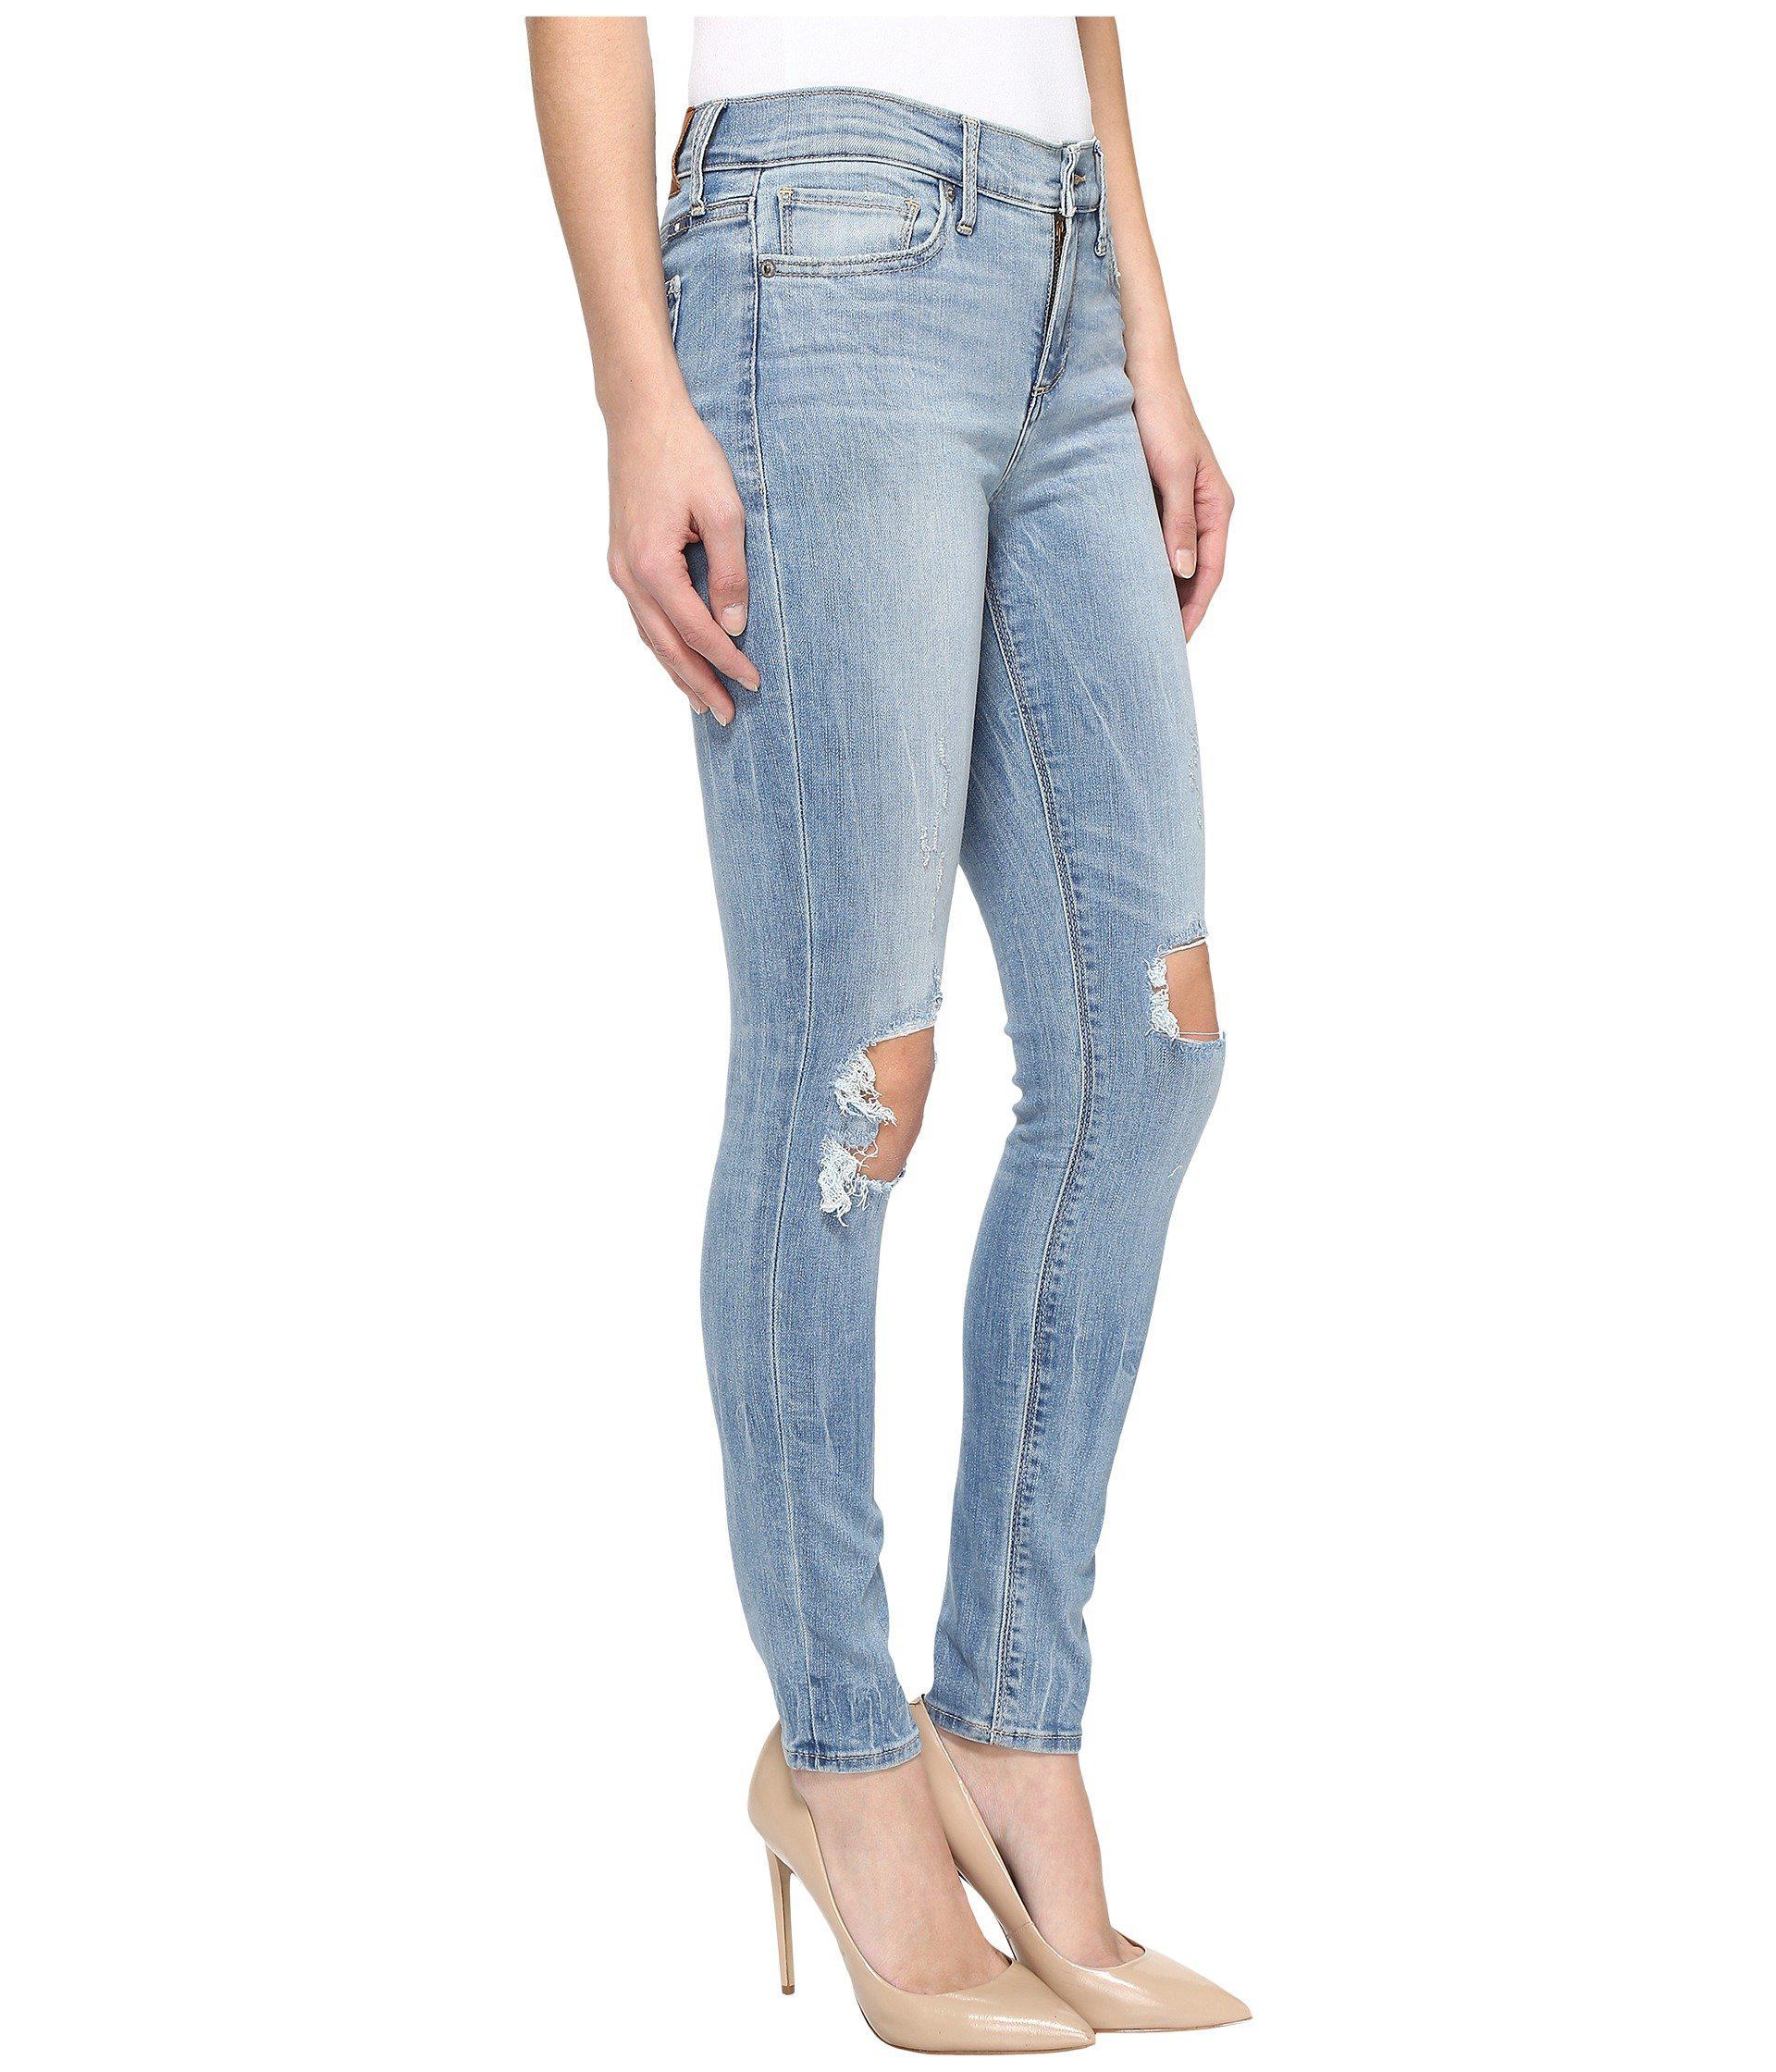 b691a212cb565 Lucky Brand Brooke Legging Jeans In Byers in Blue - Lyst